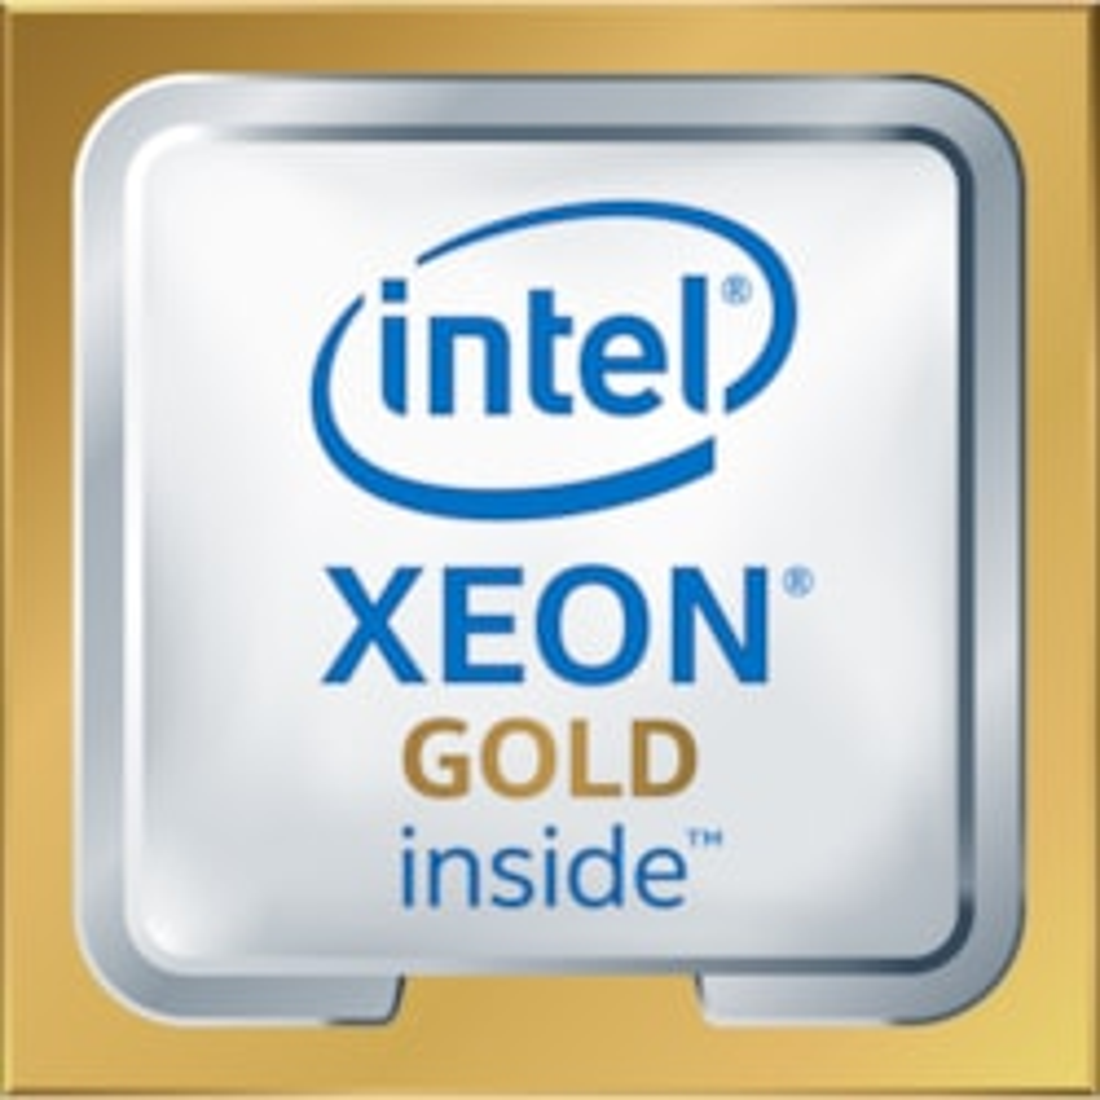 Intel Xeon 5122 Quad-core (4 Core) 3.60 GHz Processor - Retail Pack